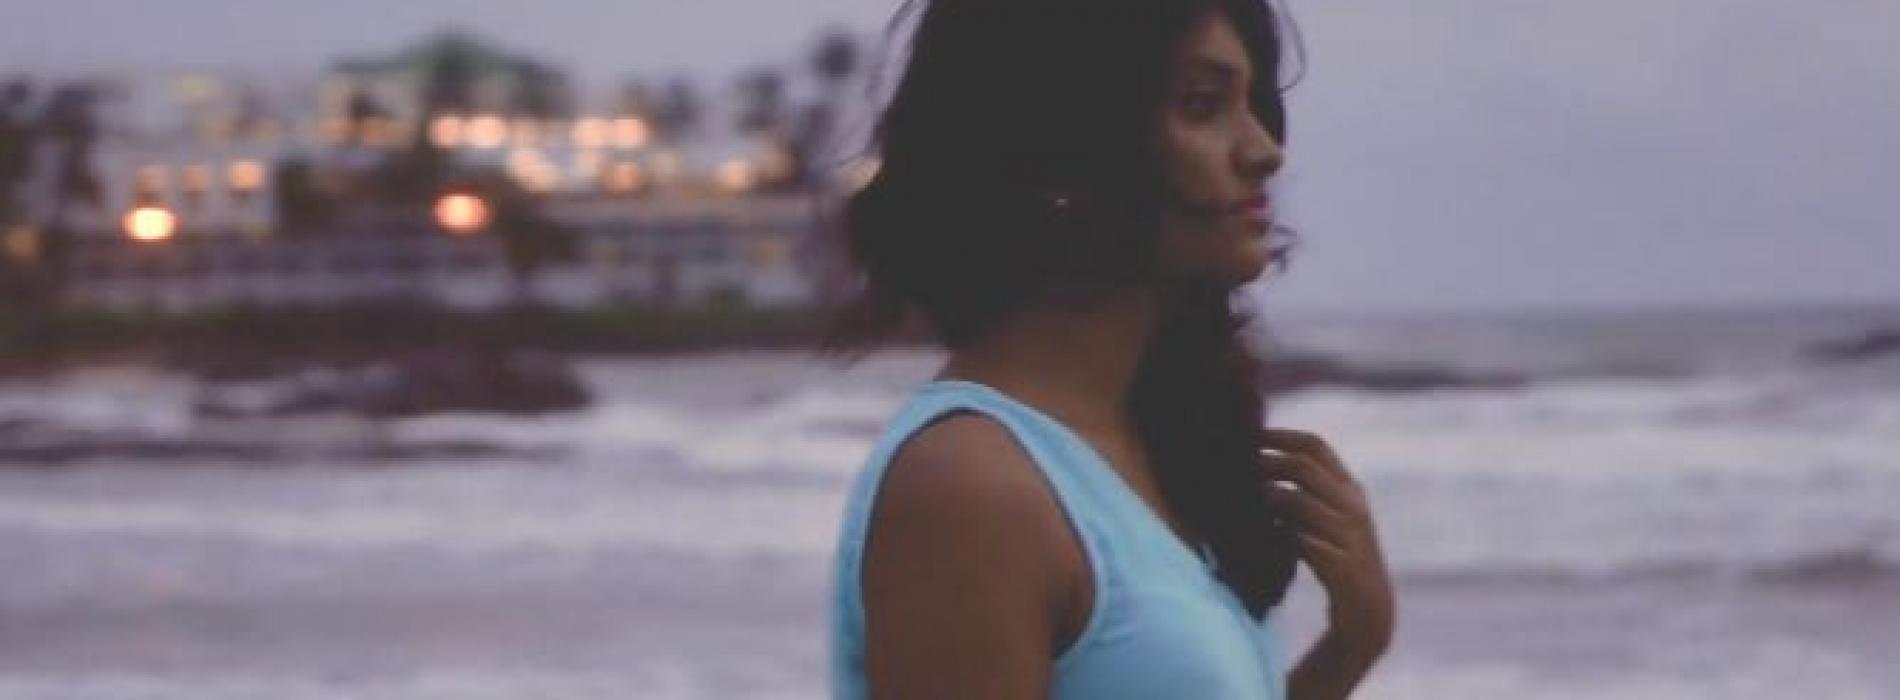 To The Light – Shavinya Illankoon (SHAVI) & Chami Kariyapperuma   Official Music Video